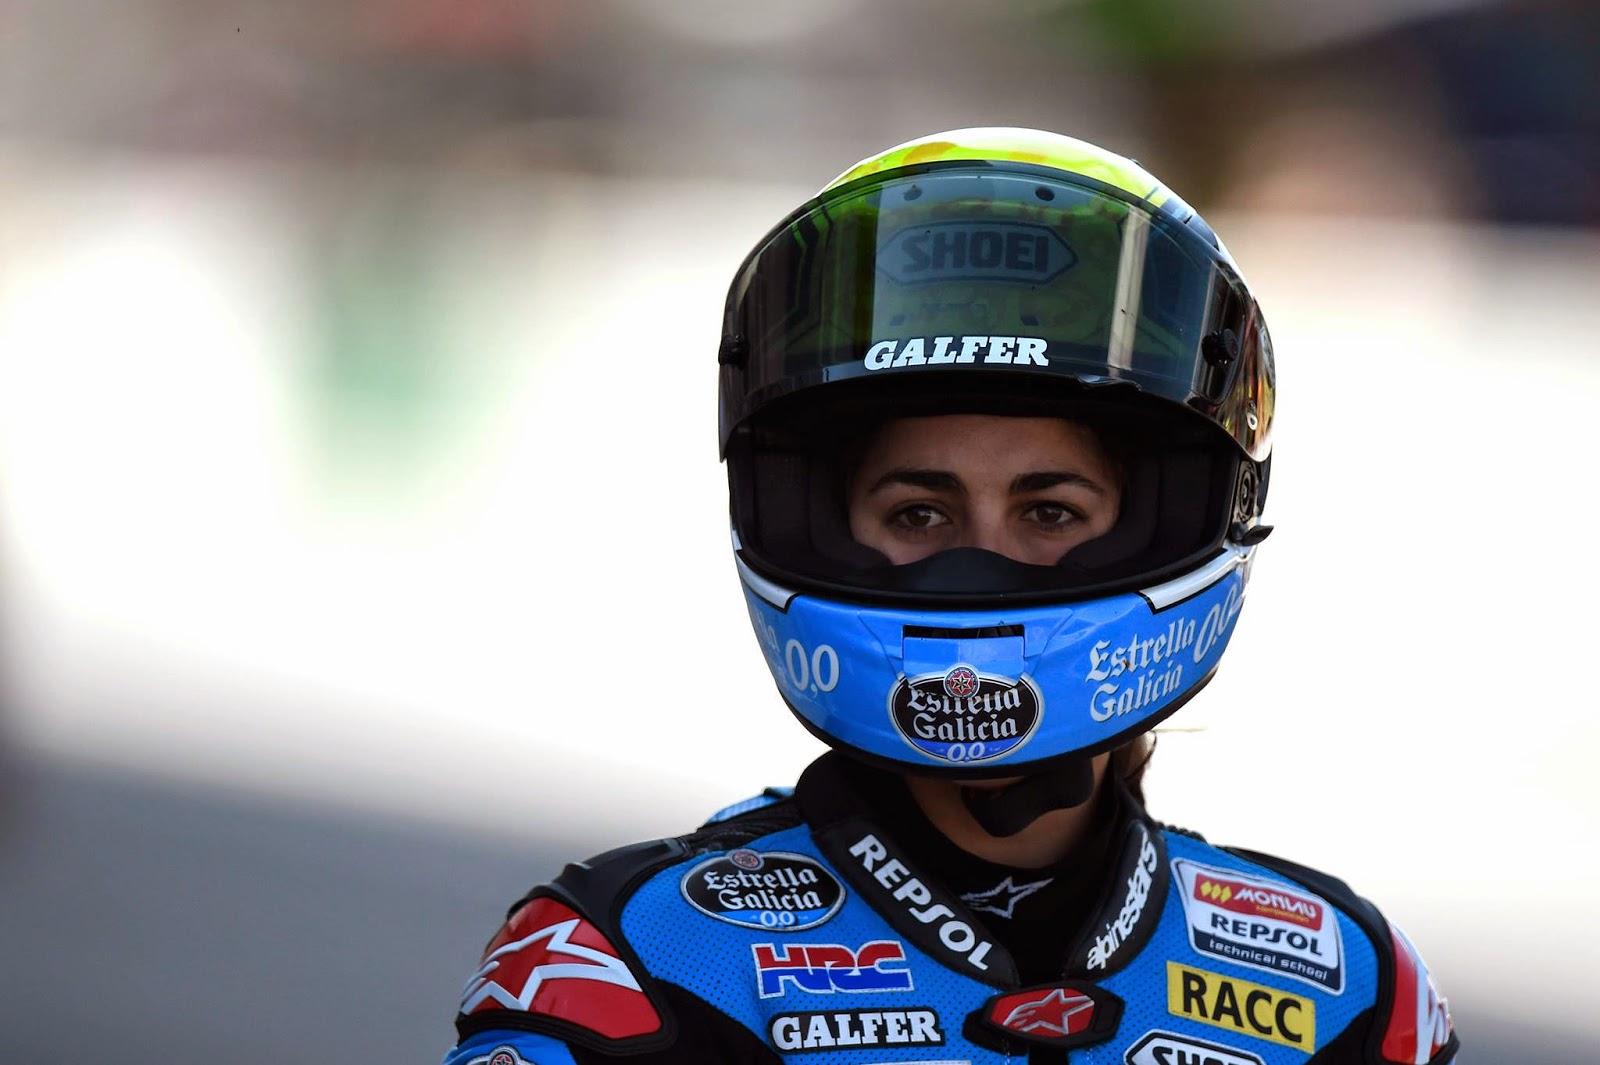 "<img src=""MaríaHerrera.jpg"" alt=""María Herrera Moto 3 FIM CEV Repsol"" title=""María Herrera, LeMans"" />"